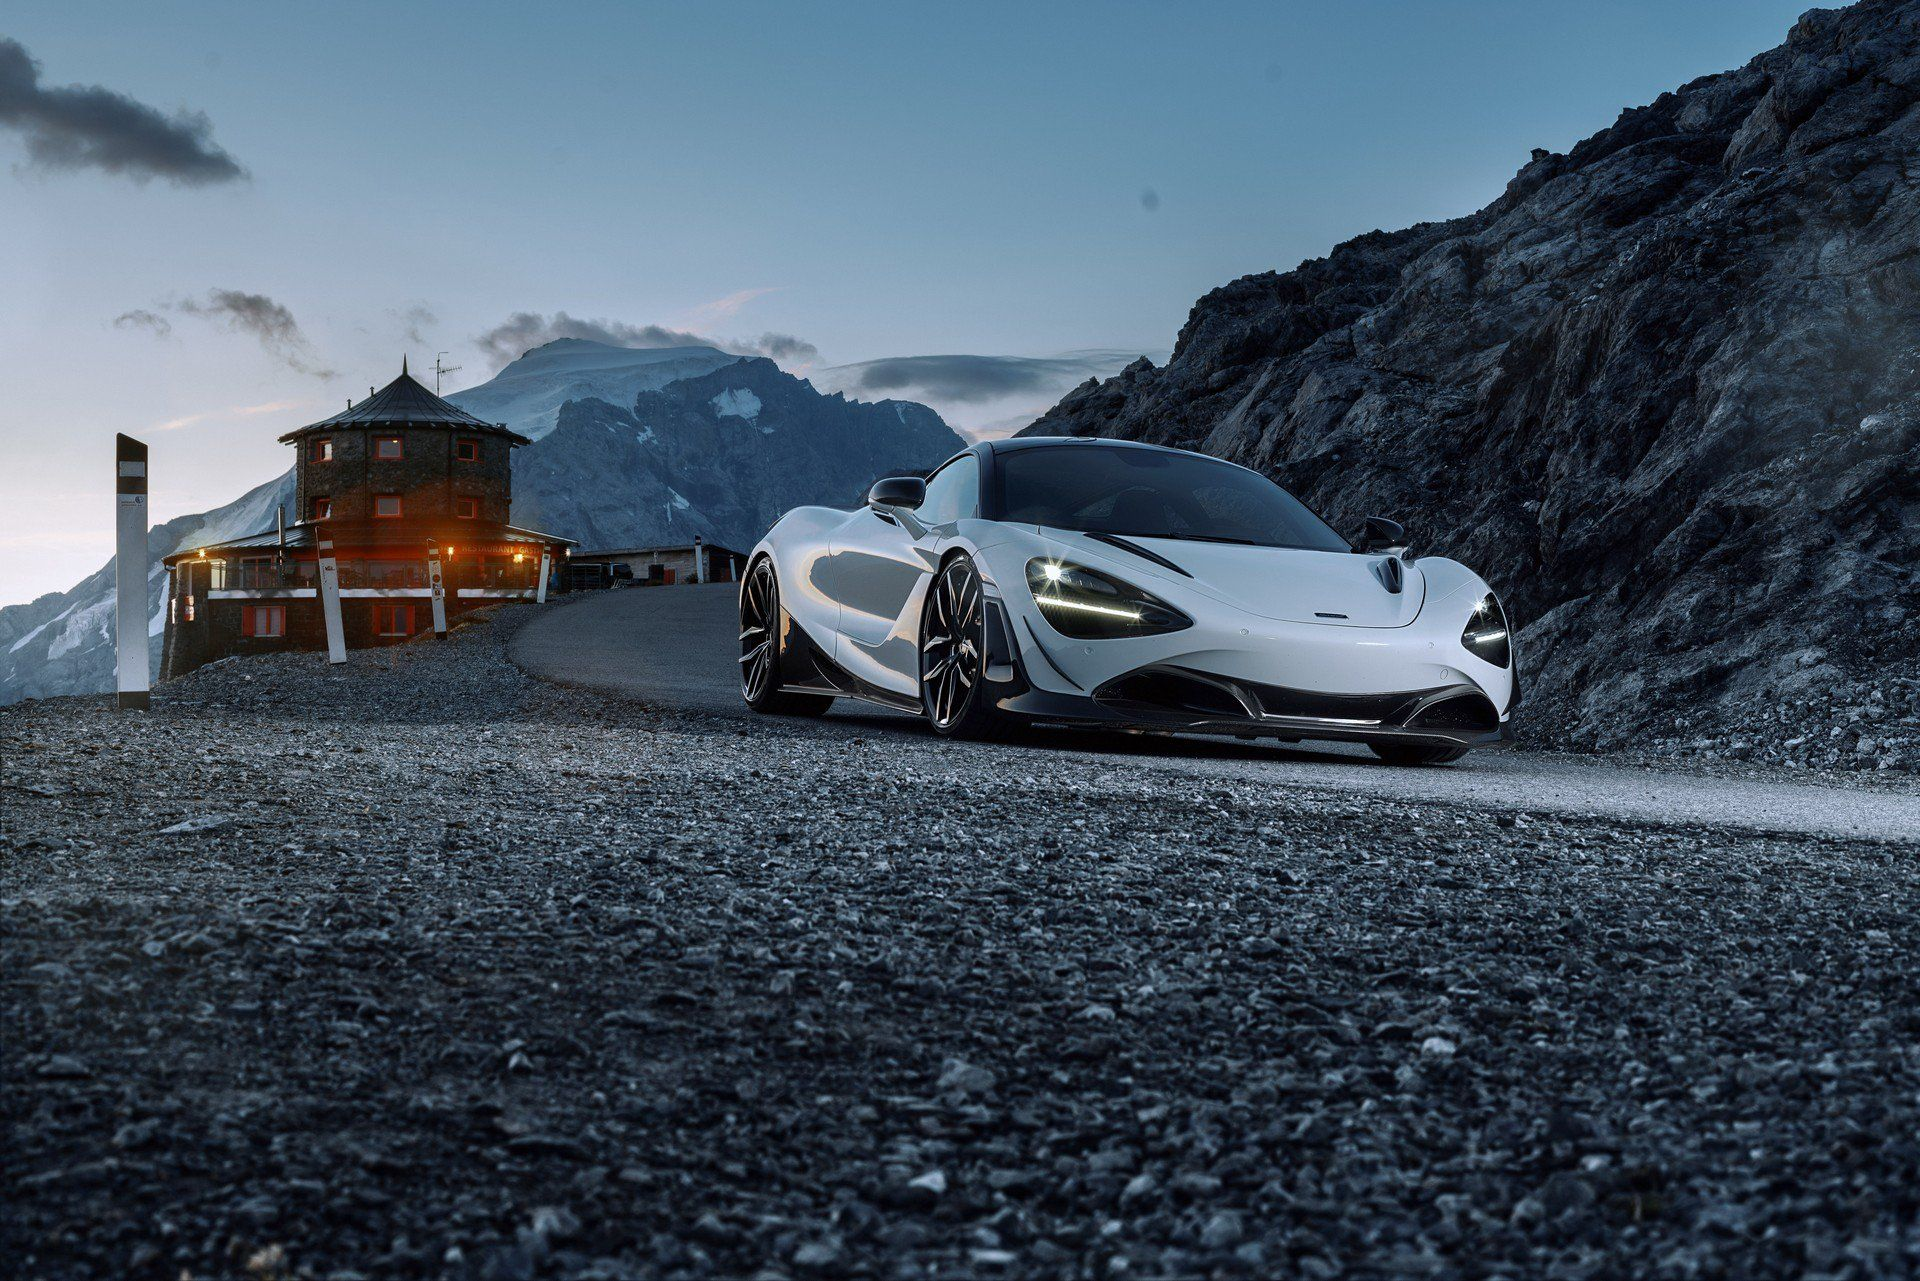 Novitec Gives The Mclaren 720s Up To 795 Hp Carscoops Car Wallpapers Super Cars Mclaren